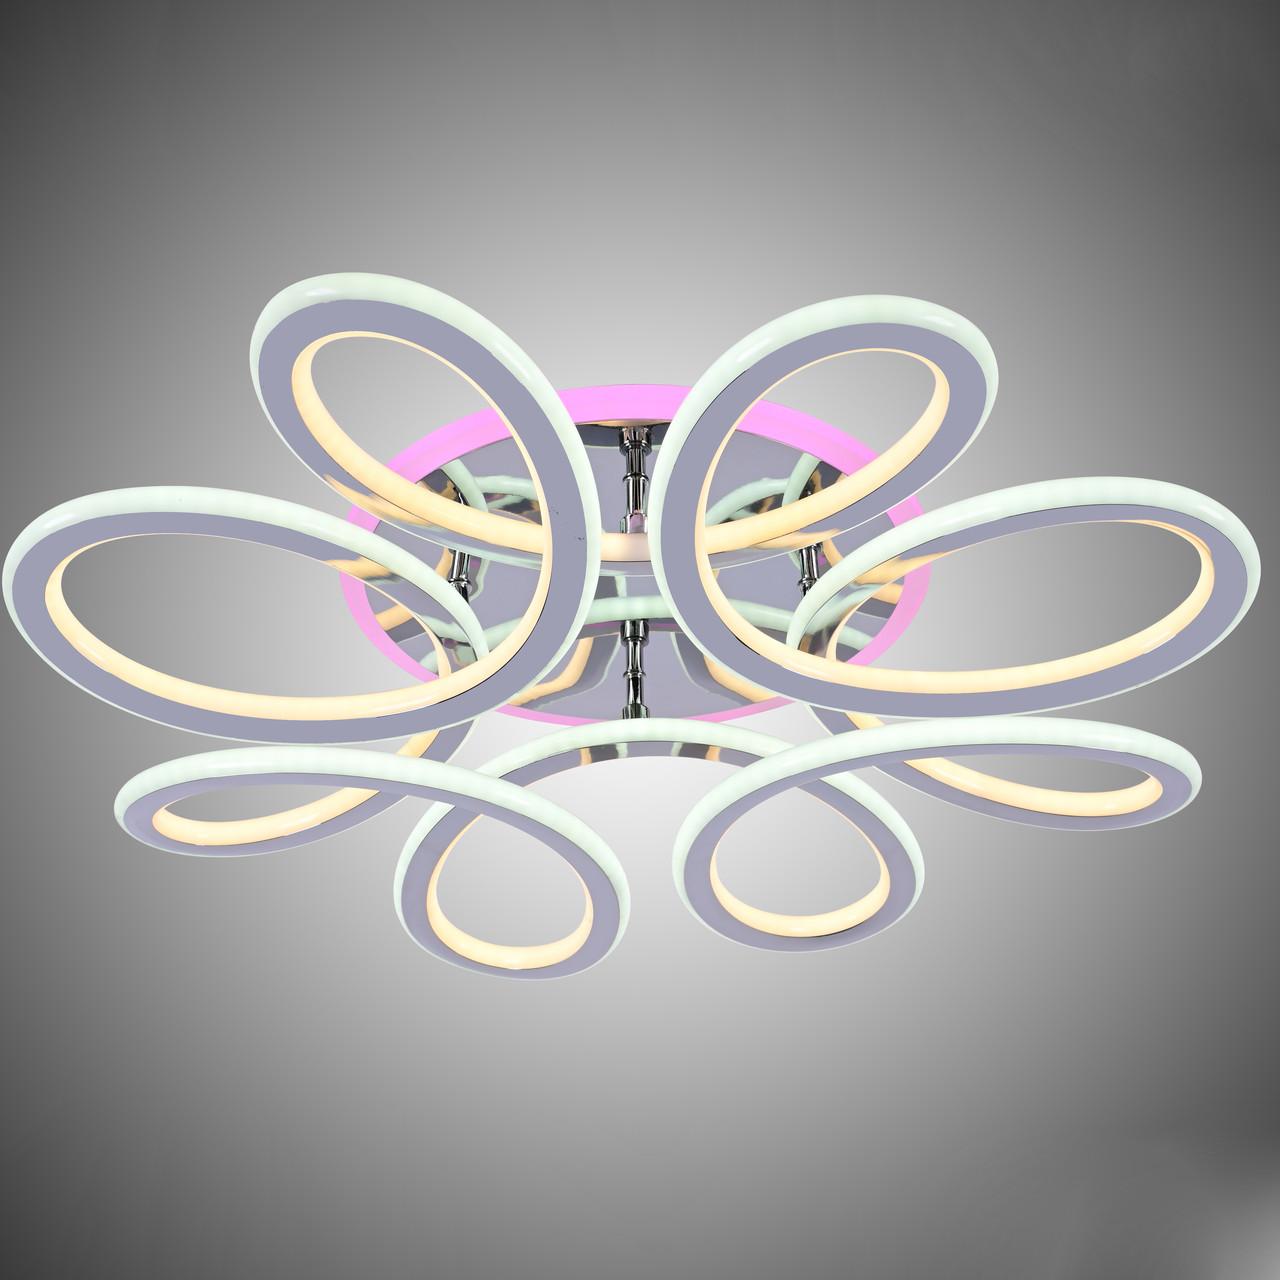 Люстра LED 87-8026/8 WH RGB 174W+30W